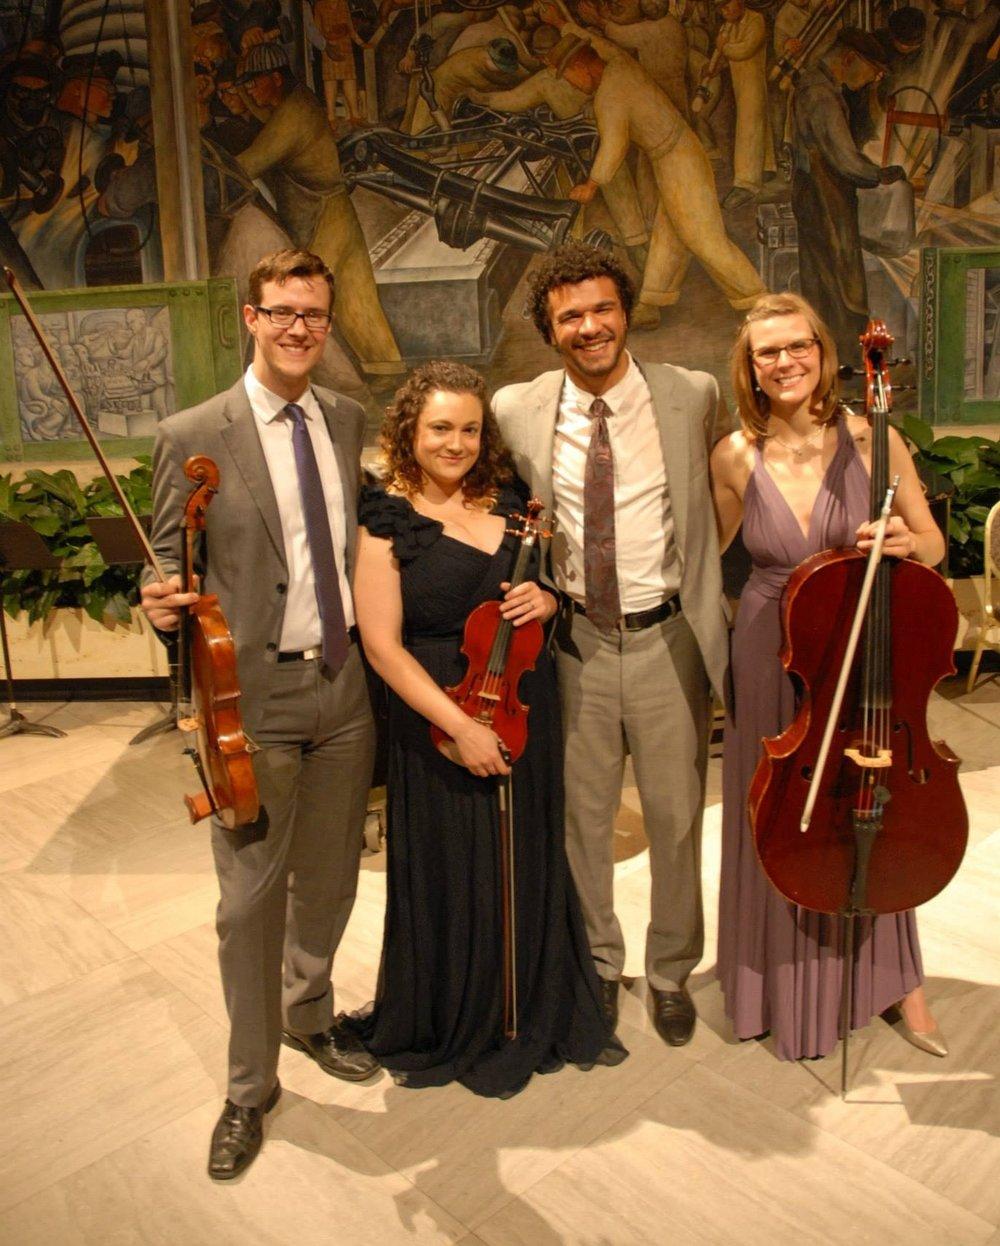 Post-Ligeti Quartet concert with the Ozaki cello and PUBLIQuartet at the Detroit Institute of Arts